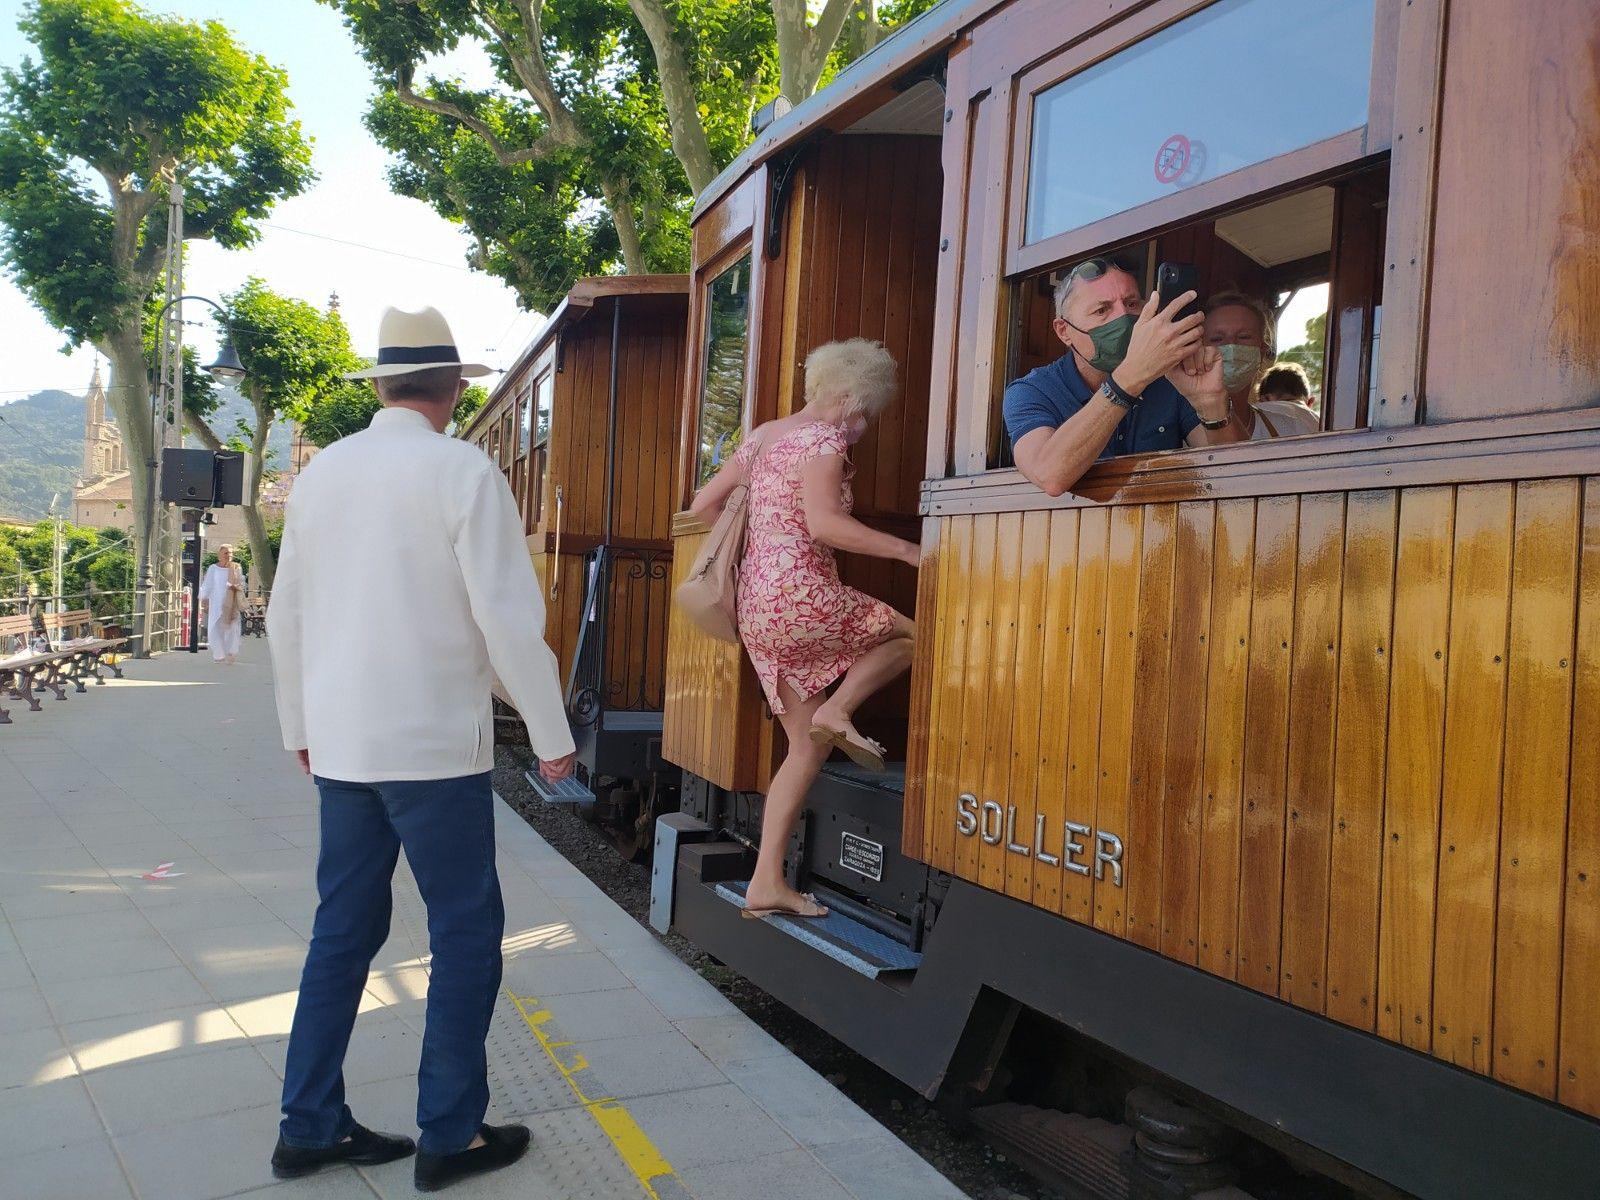 El tren de Sóller vuelve a rodar